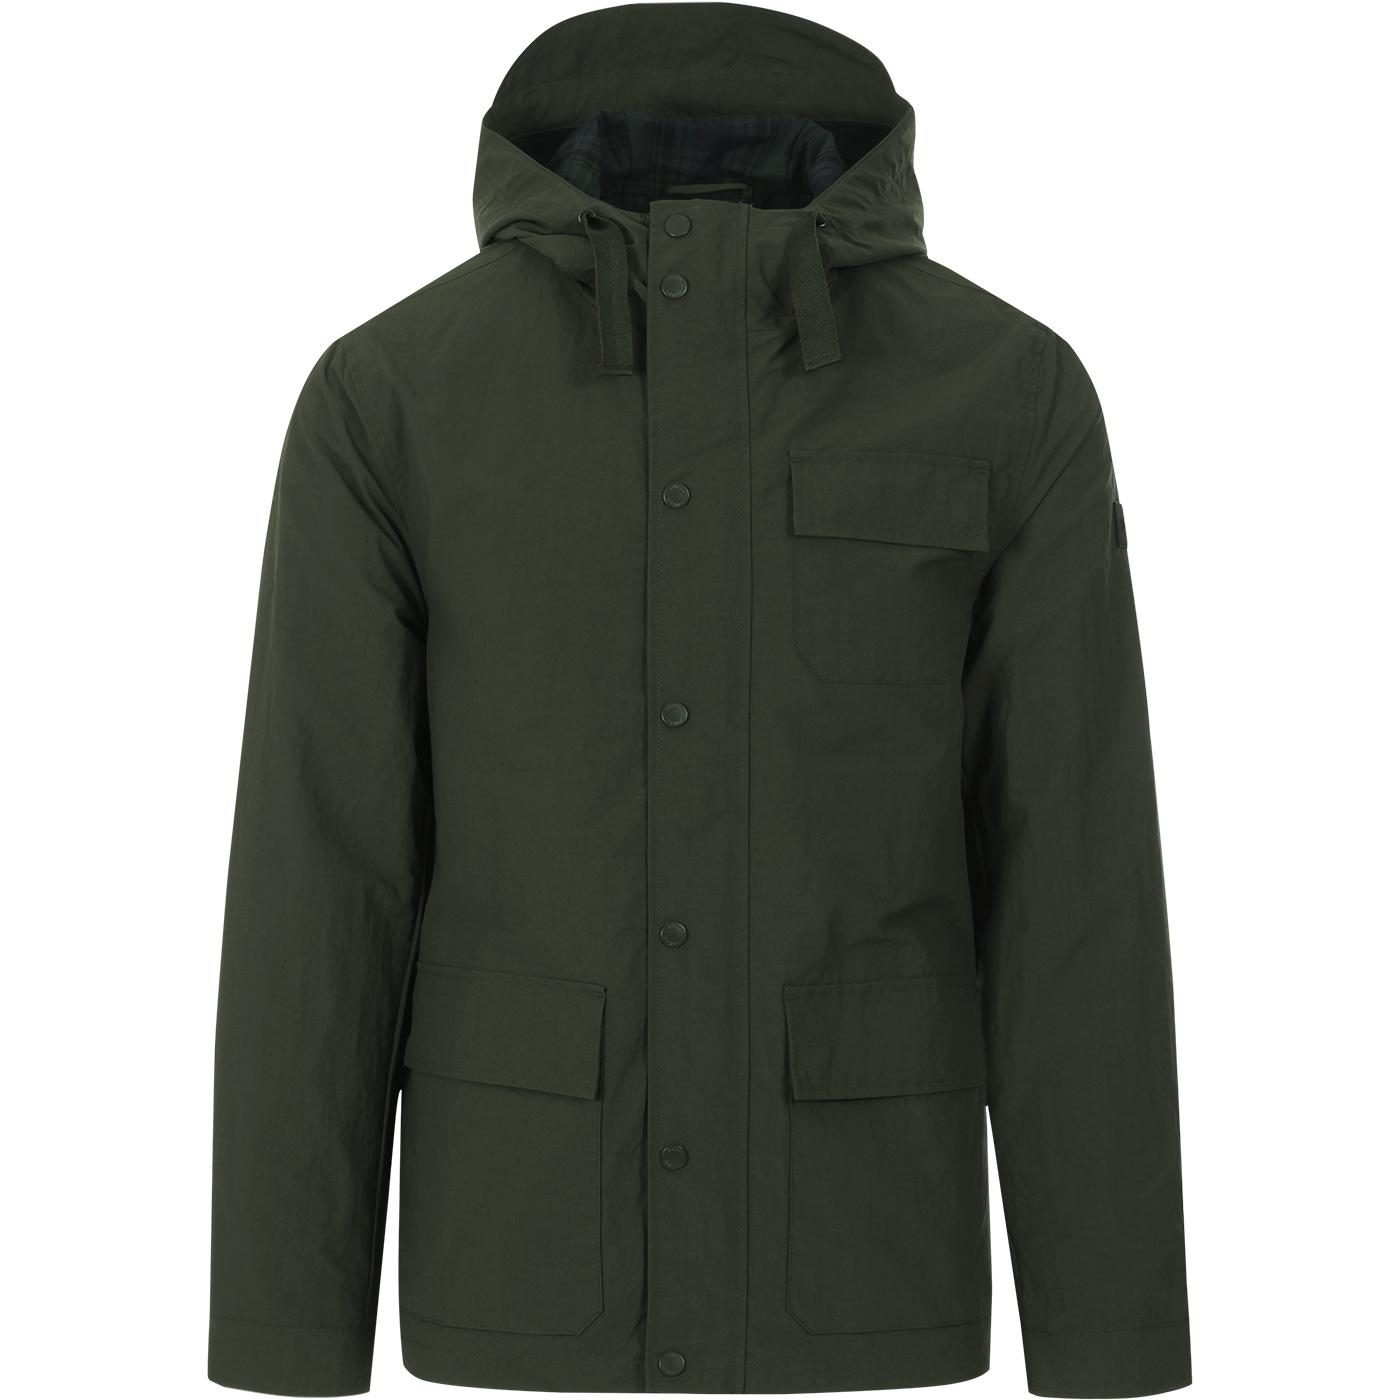 Hanley FARAH 100 Mod 3 Pocket Anorak Jacket (FG)